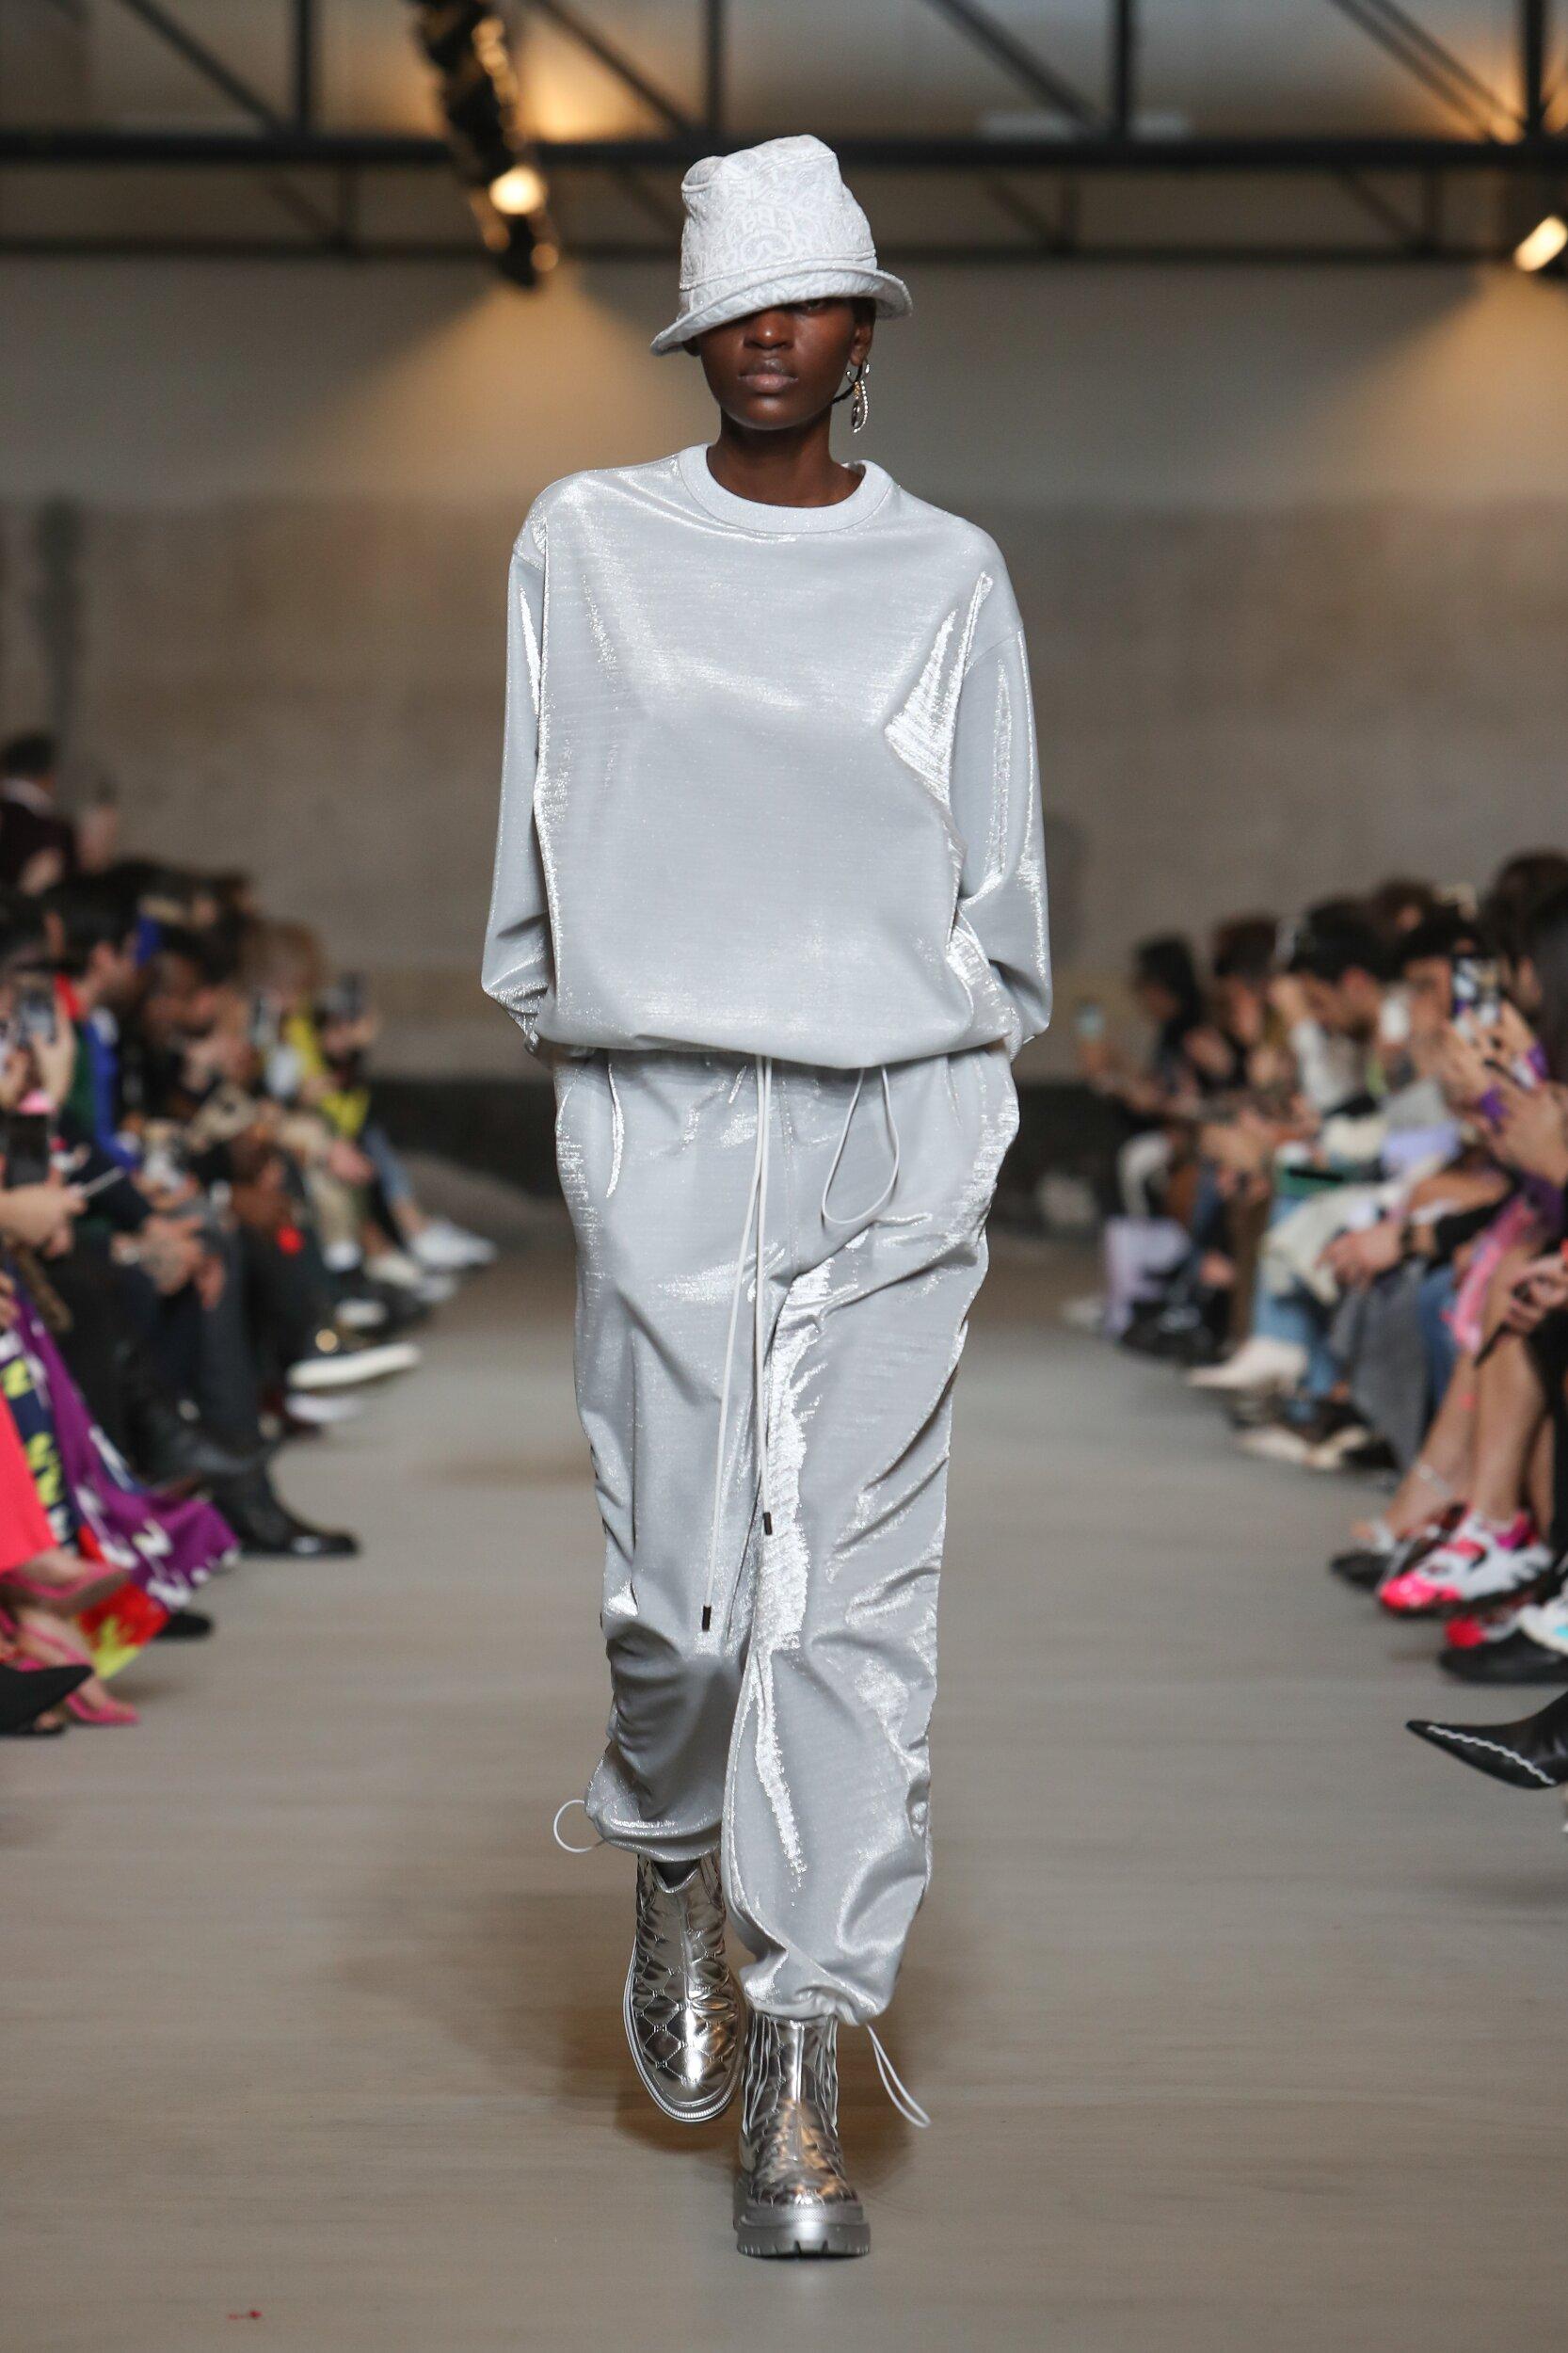 Runway Iceberg Fall Winter 2020 Women's Collection Milan Fashion Week